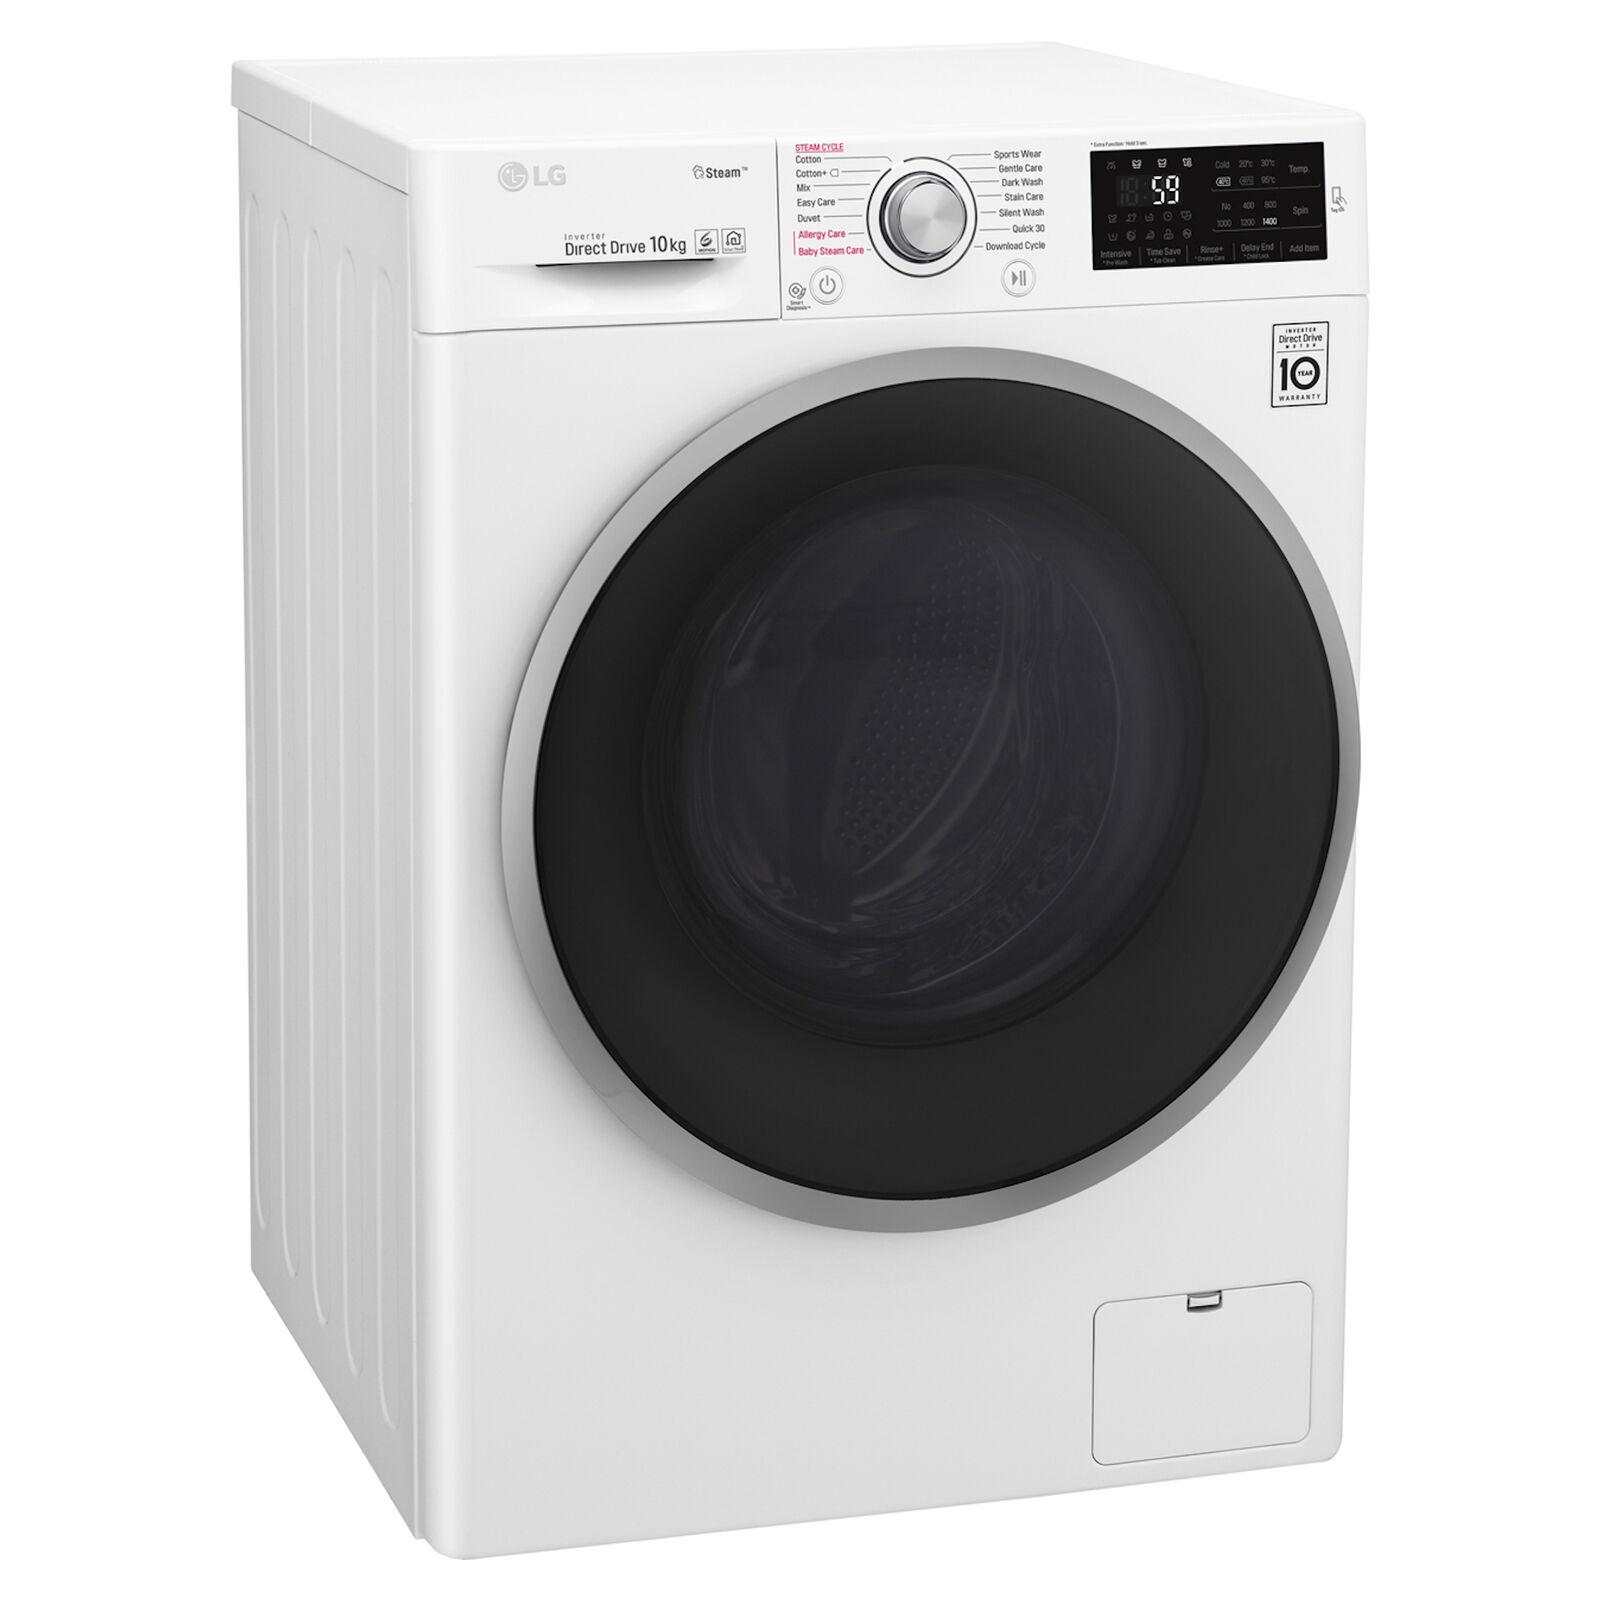 LG F4J610WS 10kg 1400rpm Washing Machine with 5 year warranty £354 with code @ Hughes Direct ebay